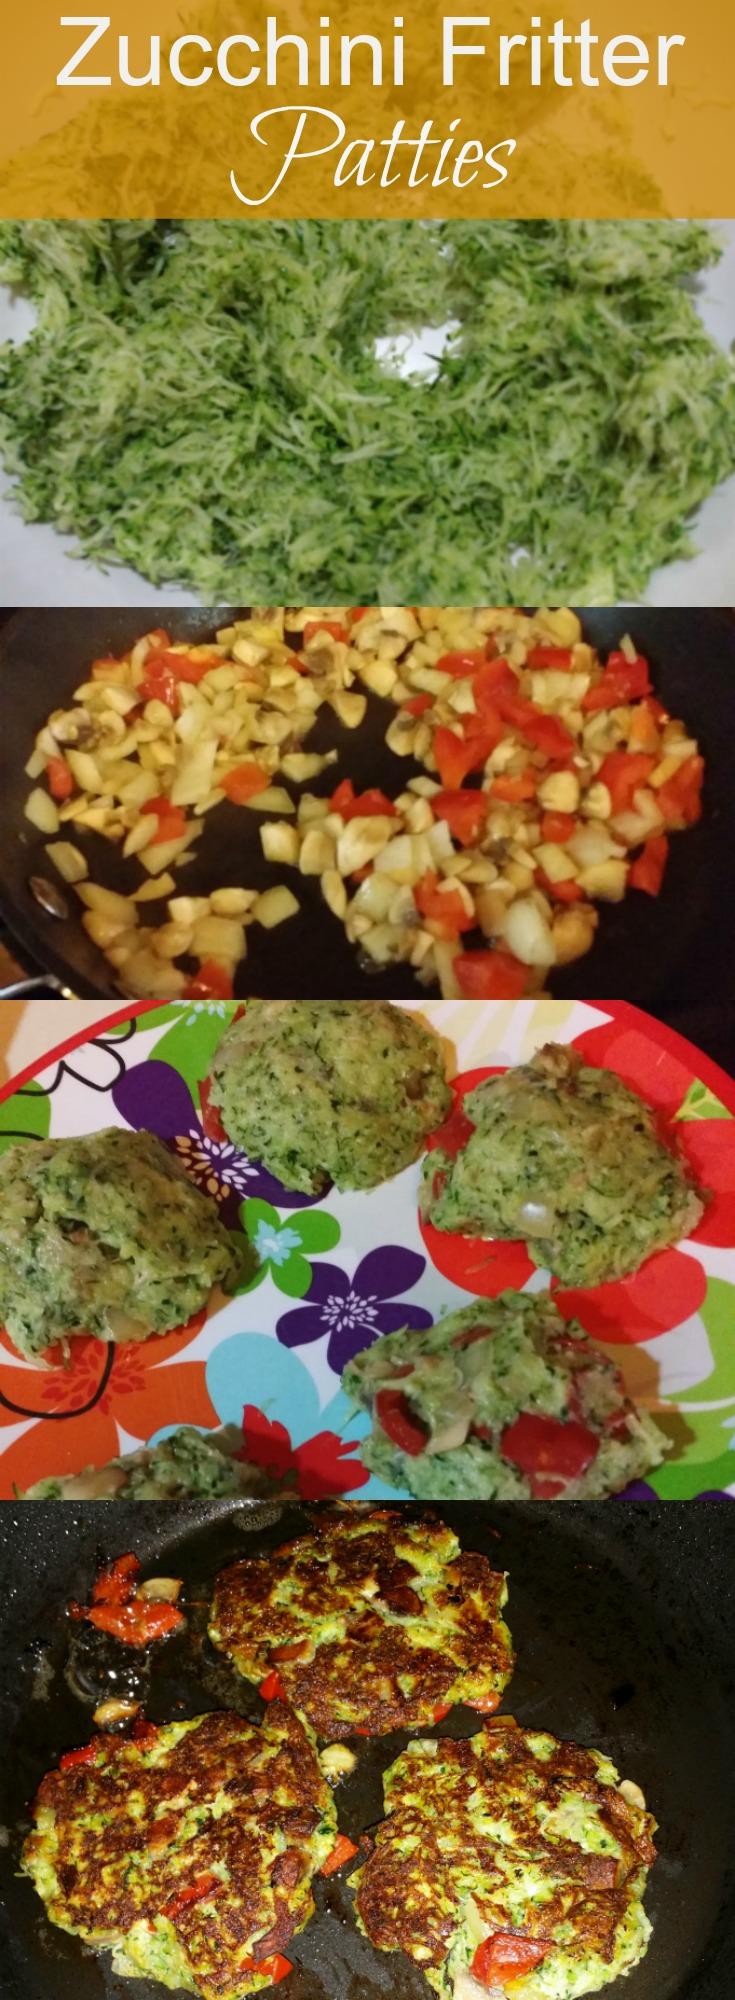 Zucchini Fritter Patties Recipe